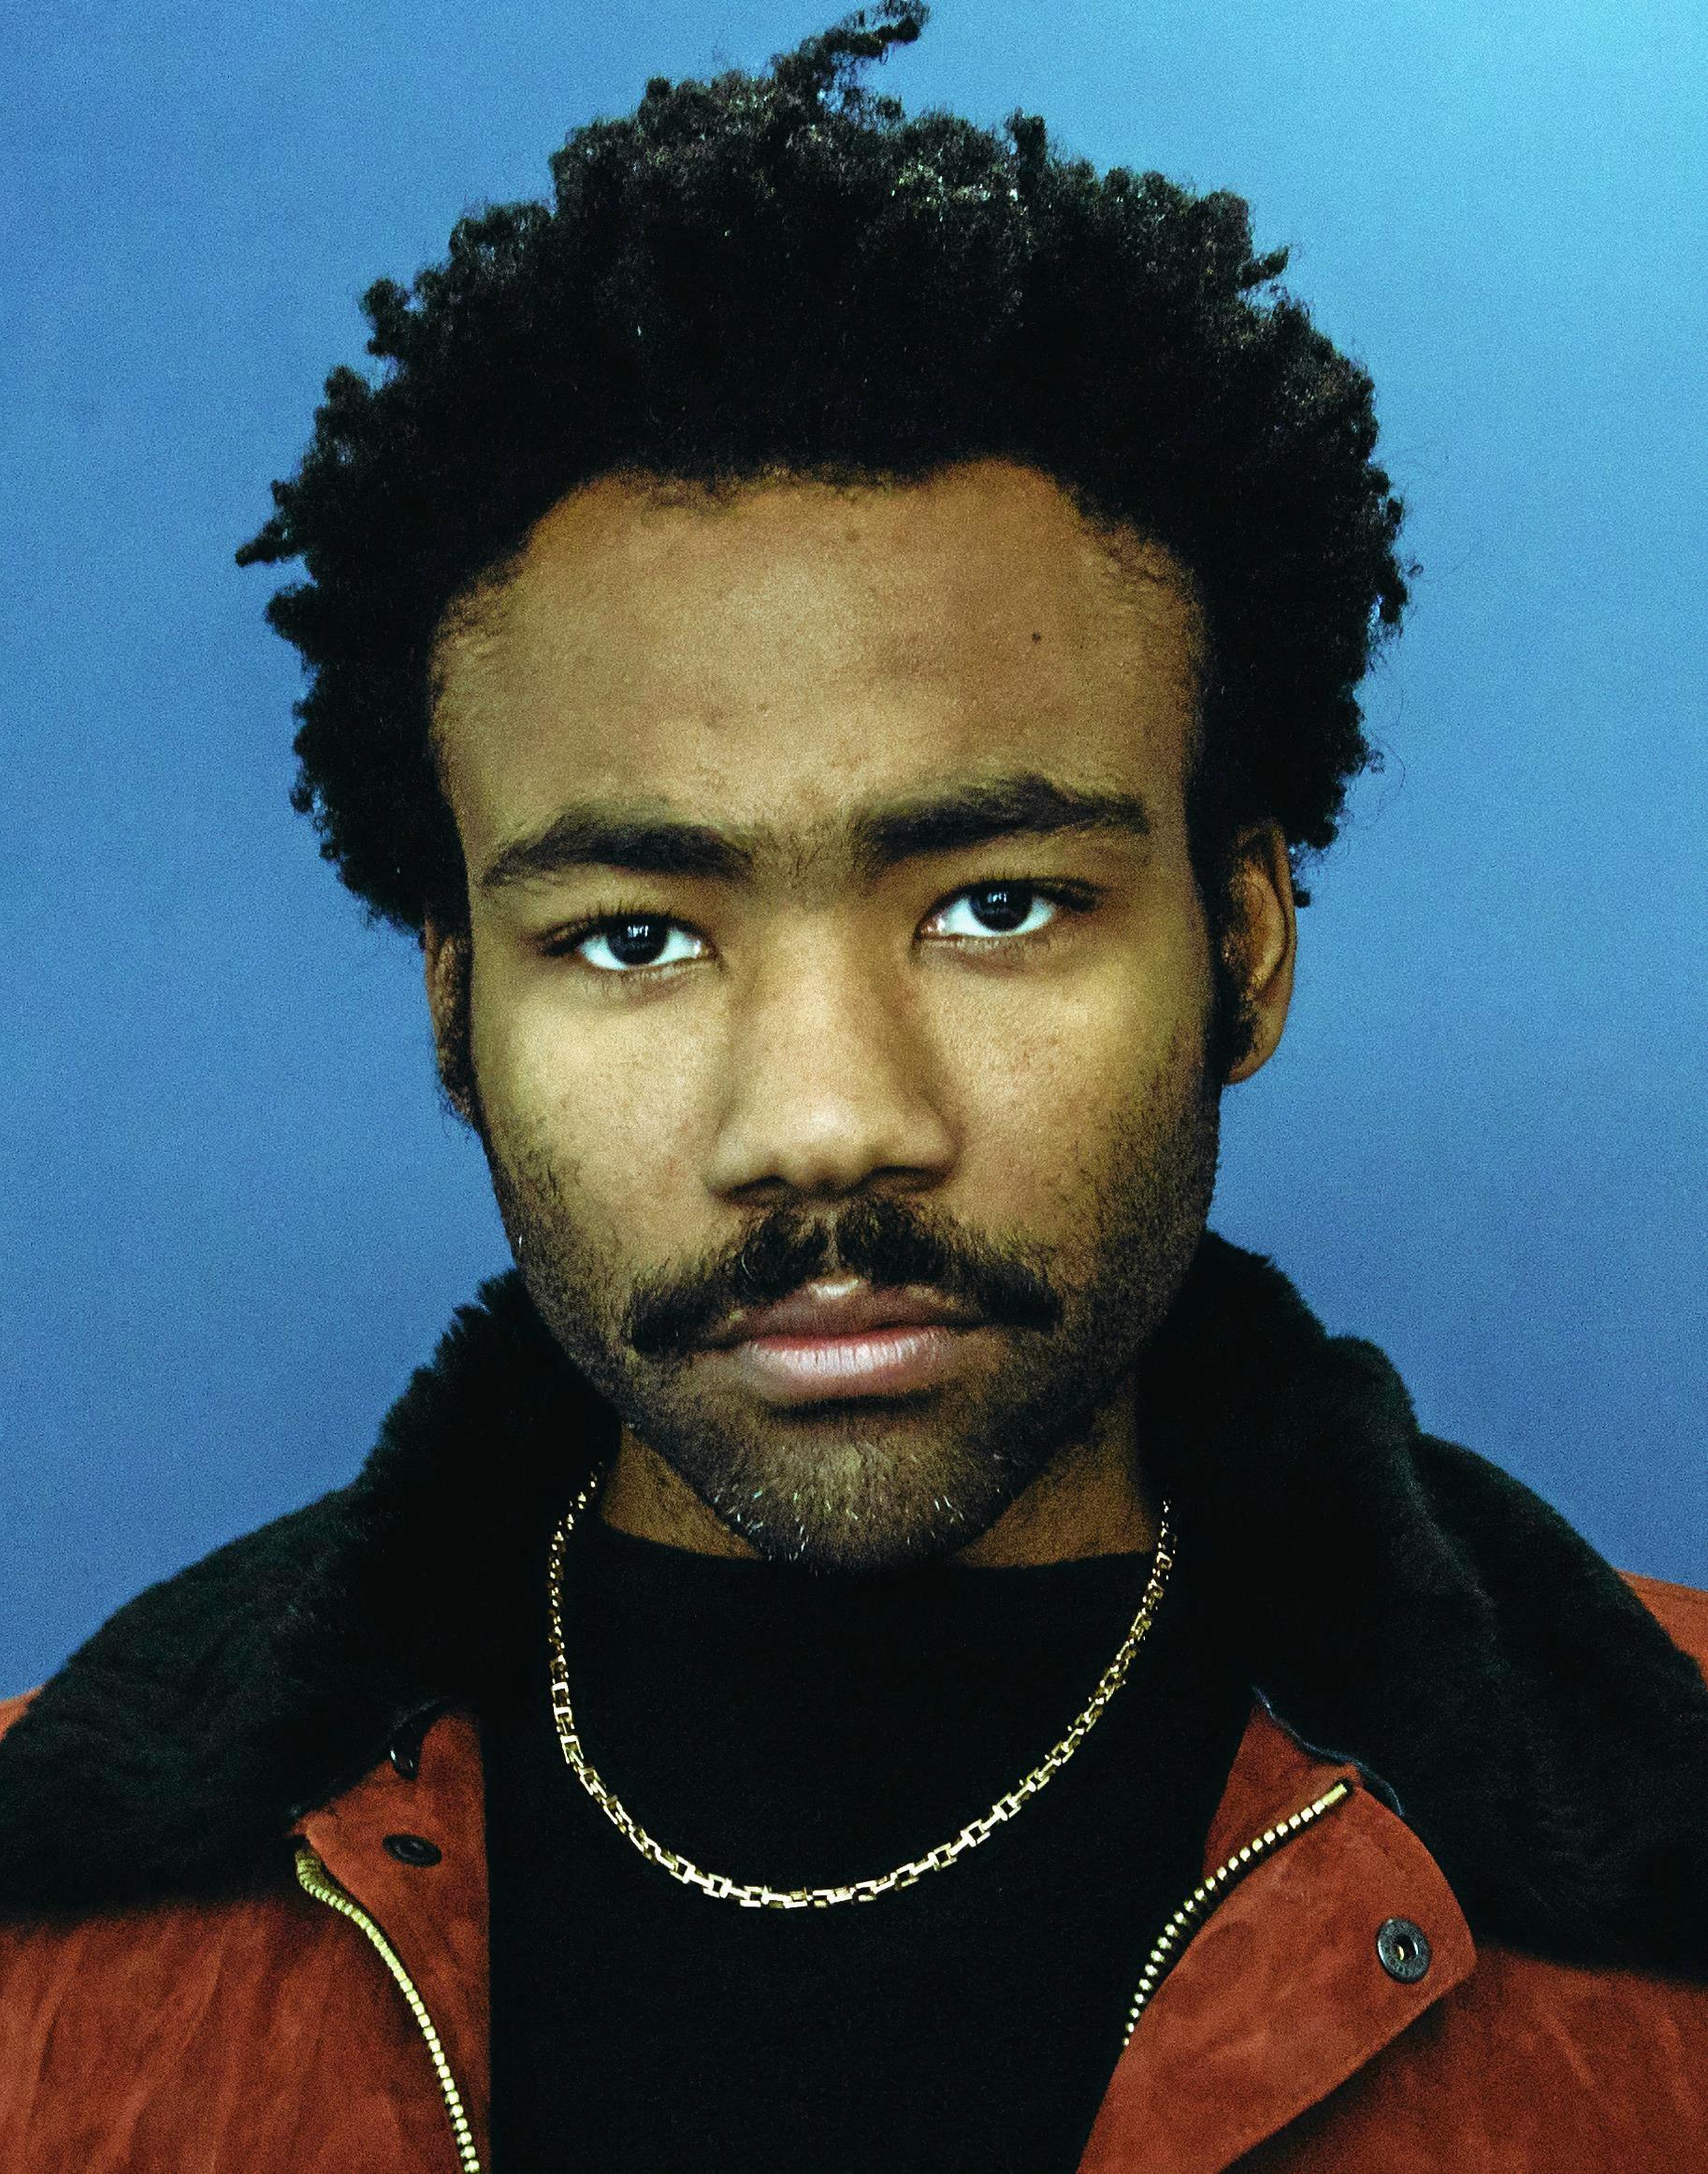 STAR: Donald McKinley Glover, aka Childish Gambino, is an American actor, writer, comedian, DJ and musician.